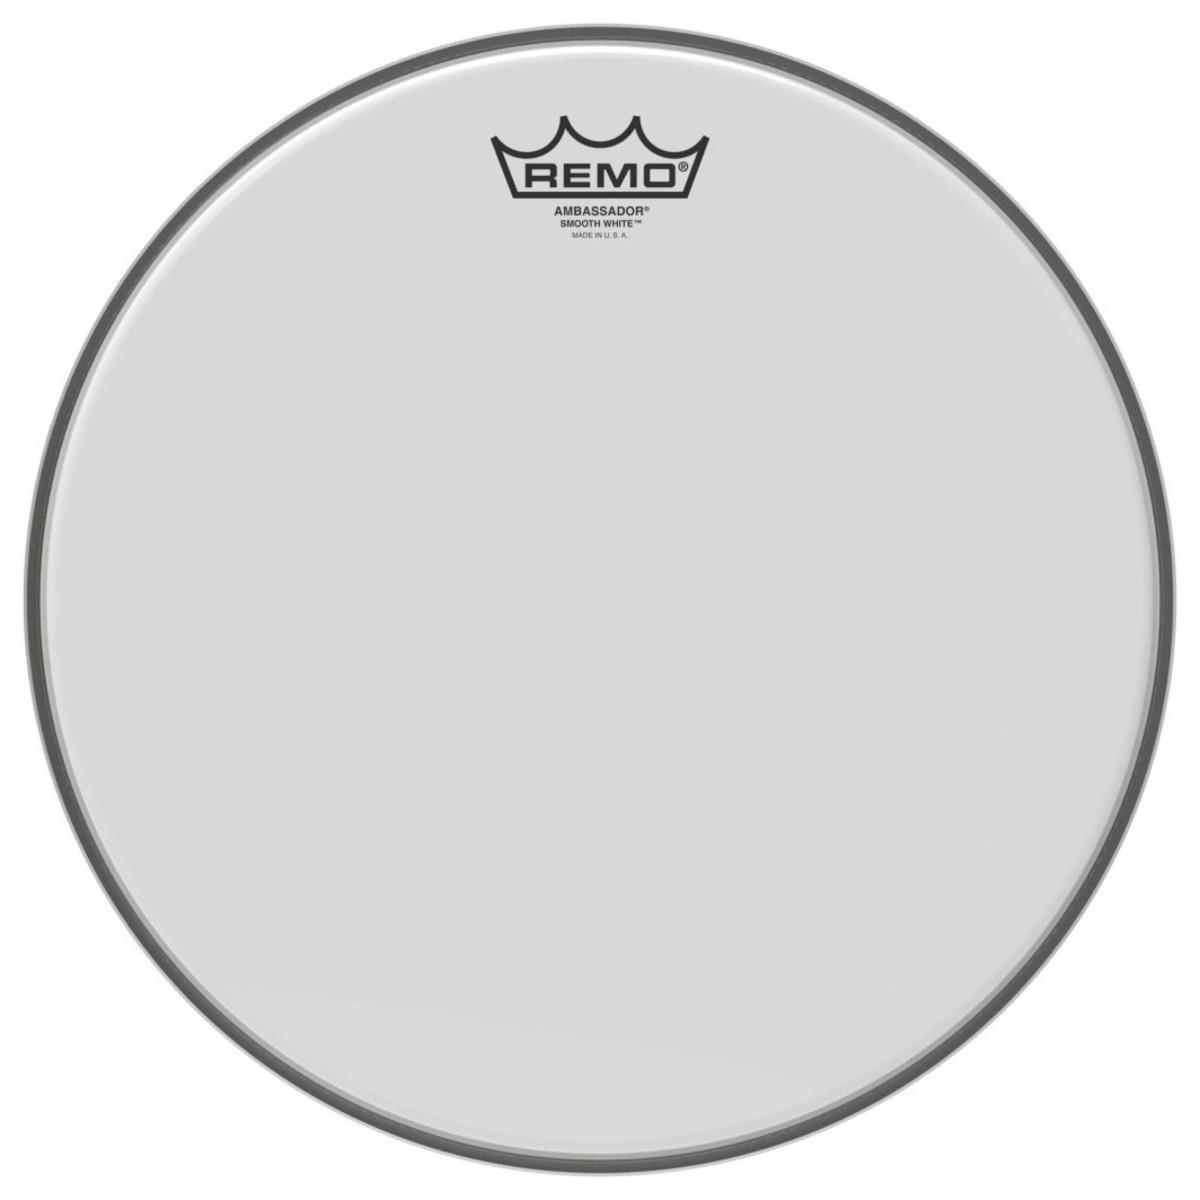 Remo Ambassador Smooth White 14 Drum Head